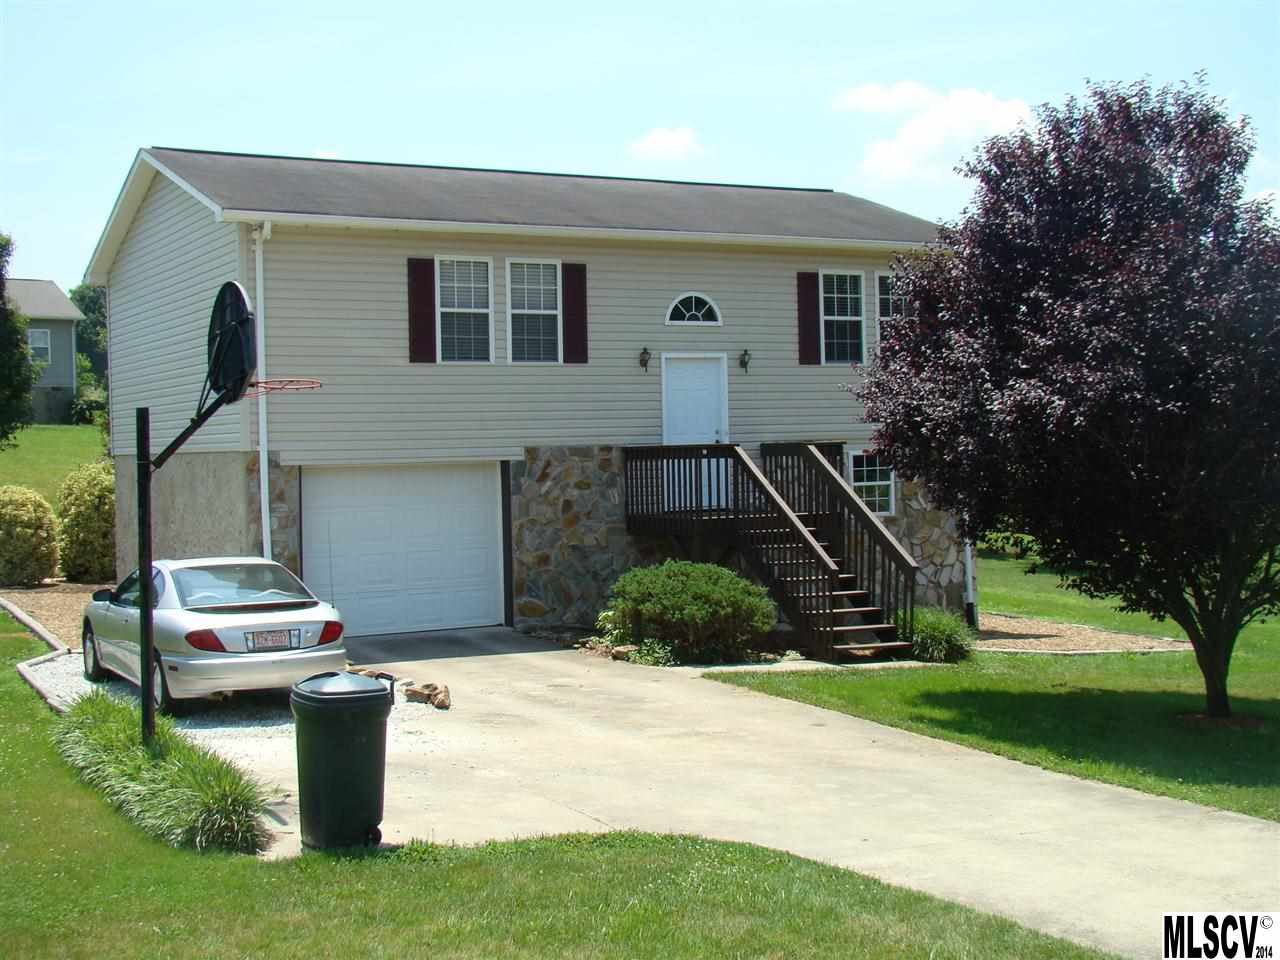 Real Estate for Sale, ListingId: 28750755, Granite Falls,NC28630